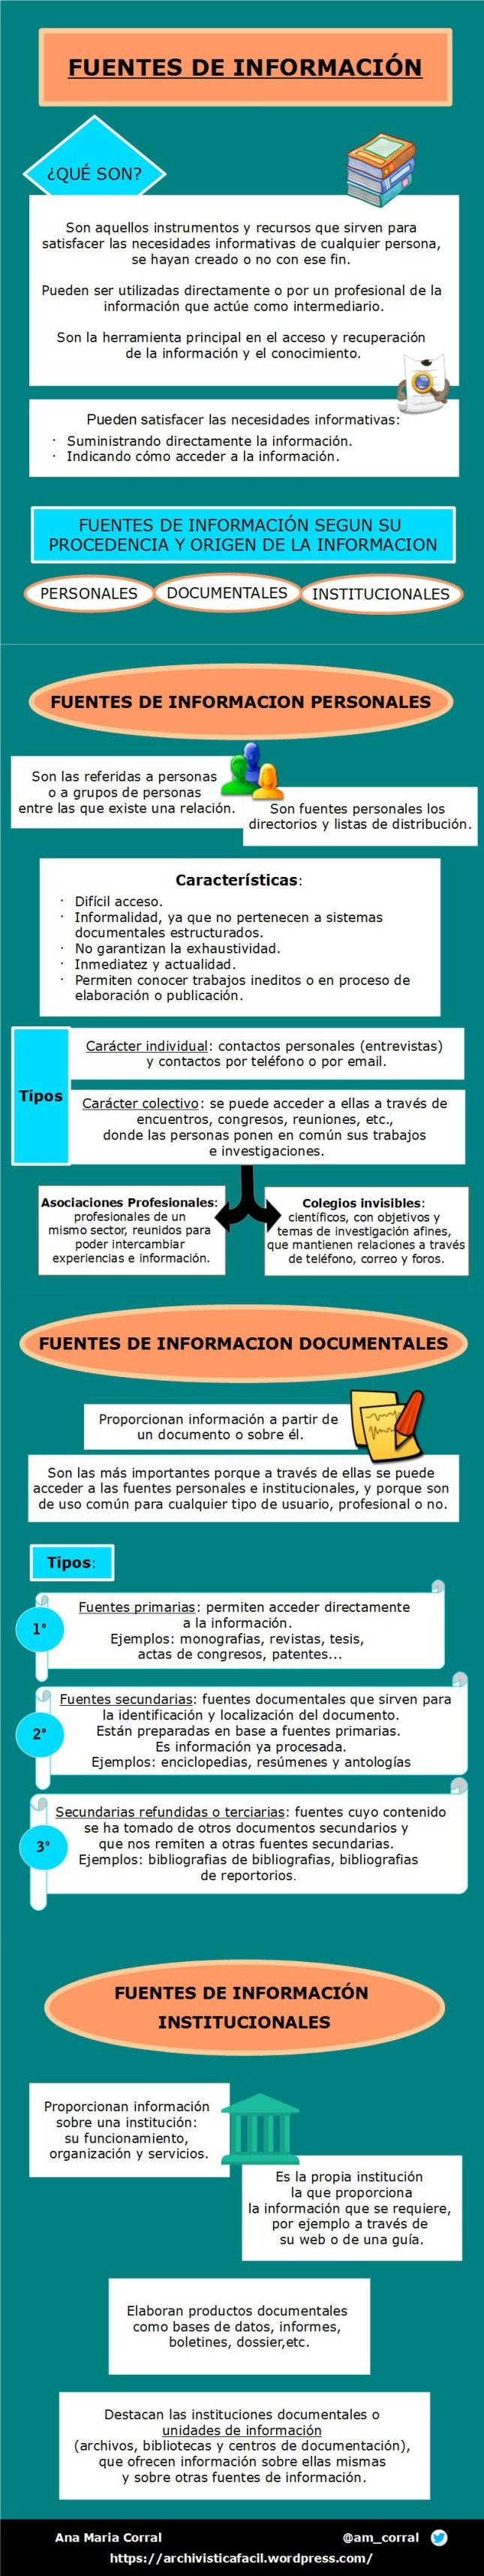 Infografia sobre la tipologia de las fuentes de informacion